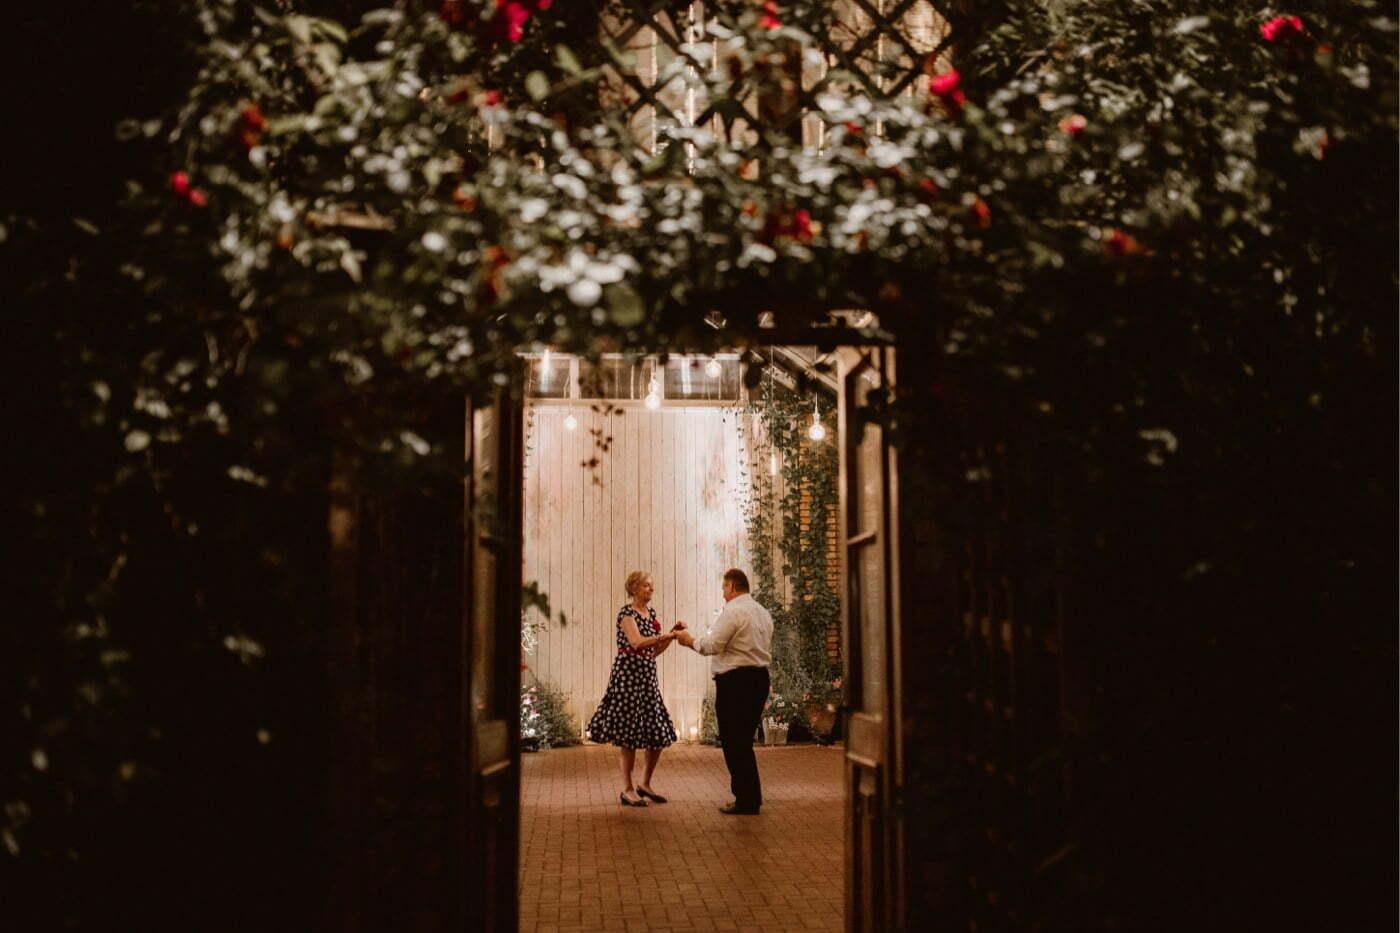 ewelina zieba rustykalne wesele stara oranzeria warszawa 084